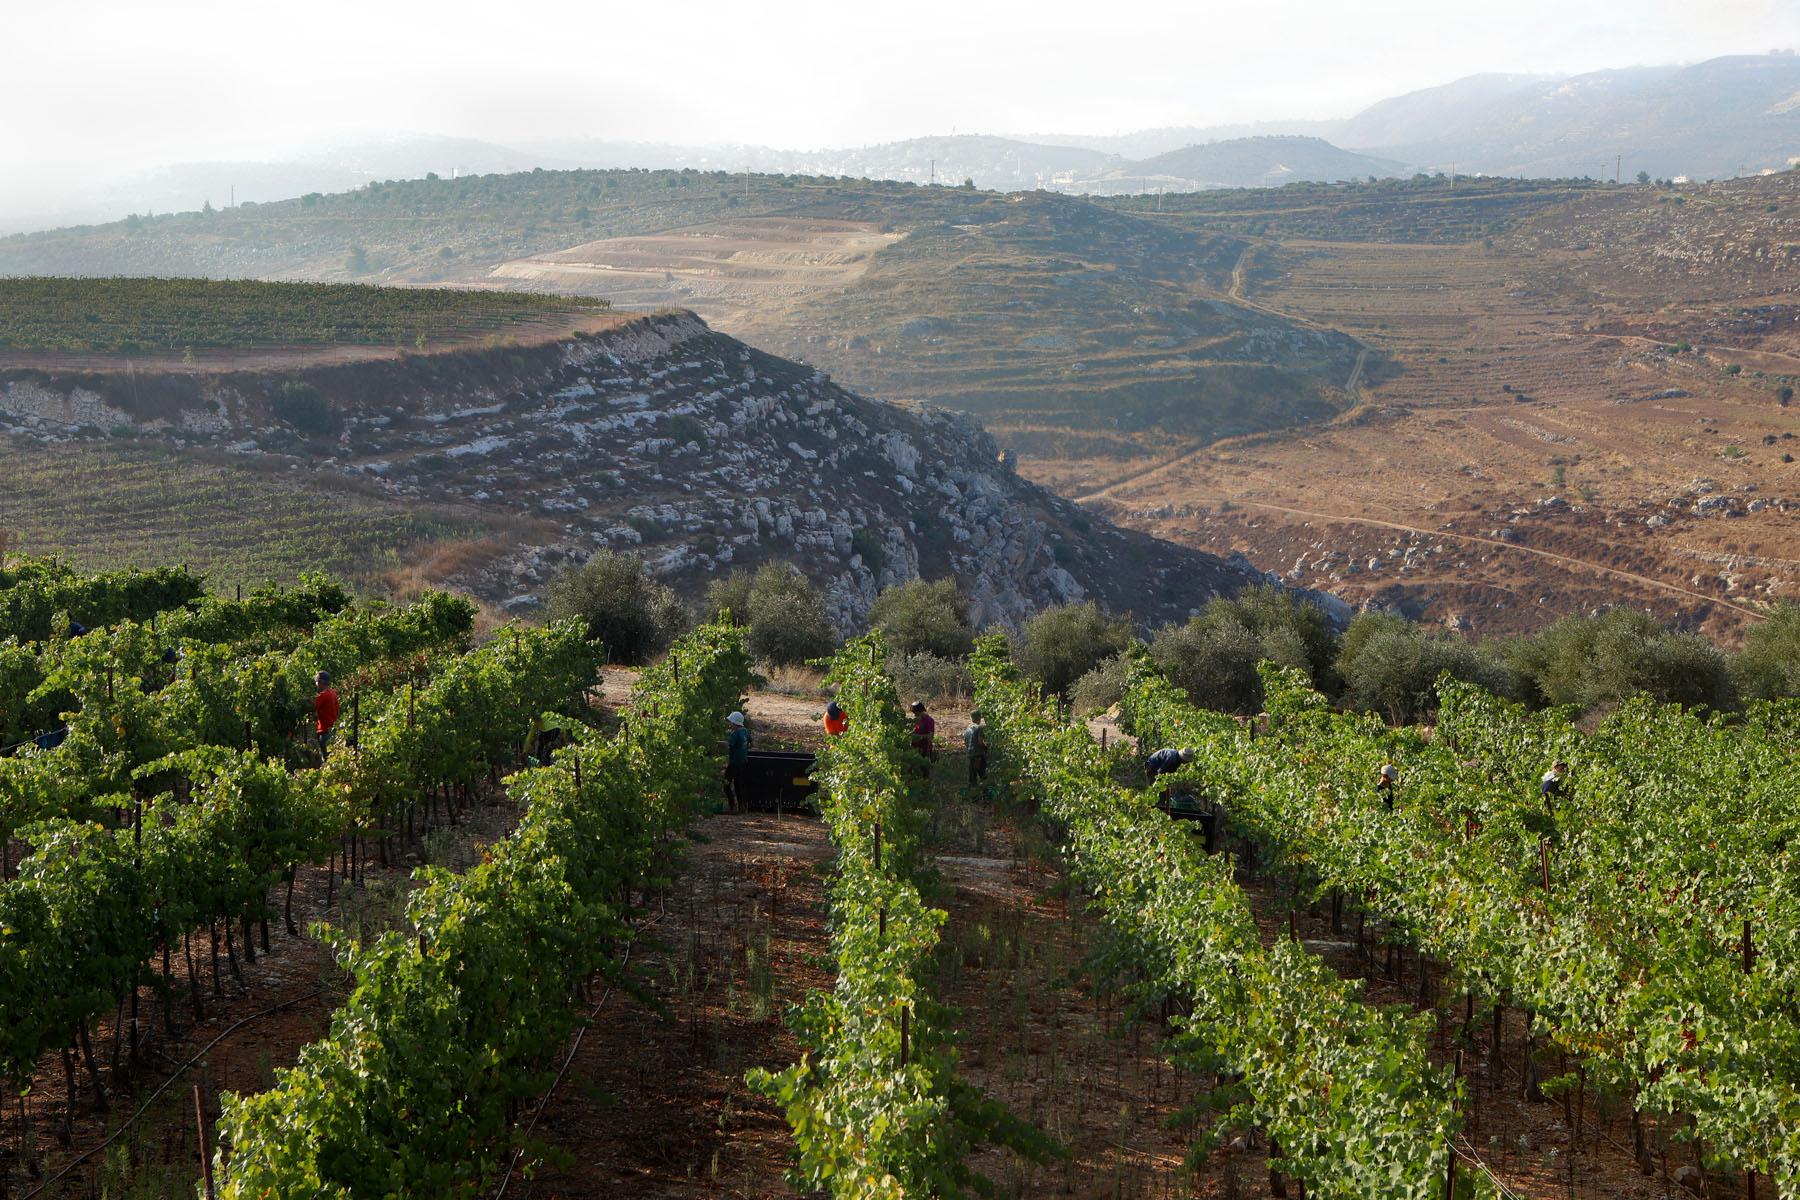 Vineyards in Shomron Hills